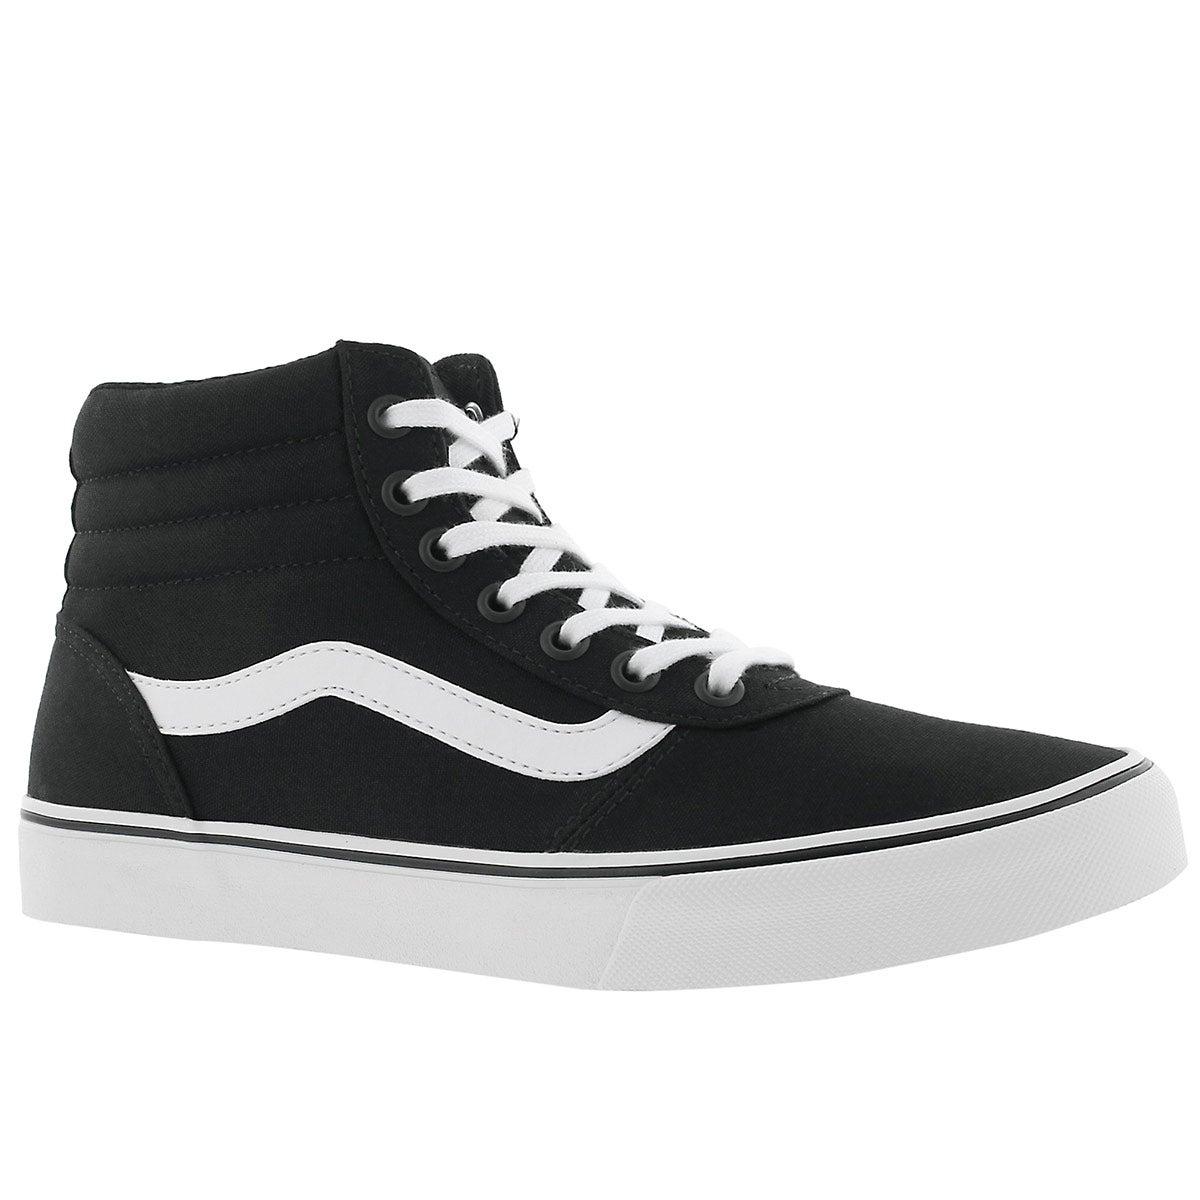 Women's MADDIE HI black/white laceup sneakers